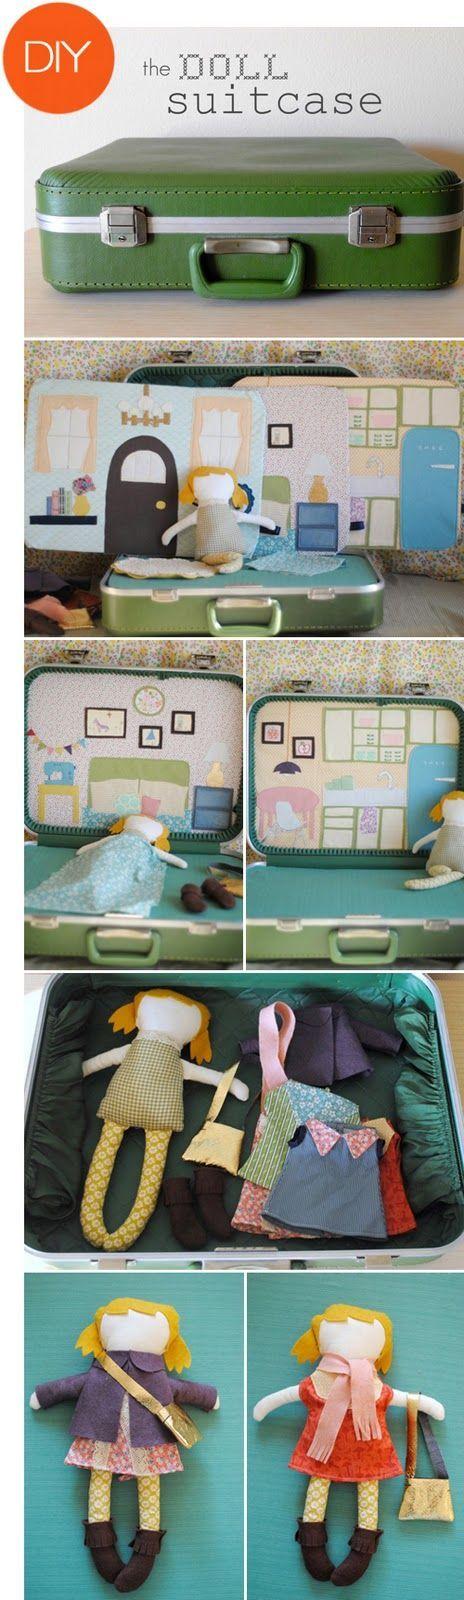 5 koffer hacks - koffer in de kinderkamer - koffer als speelgoed - DIY